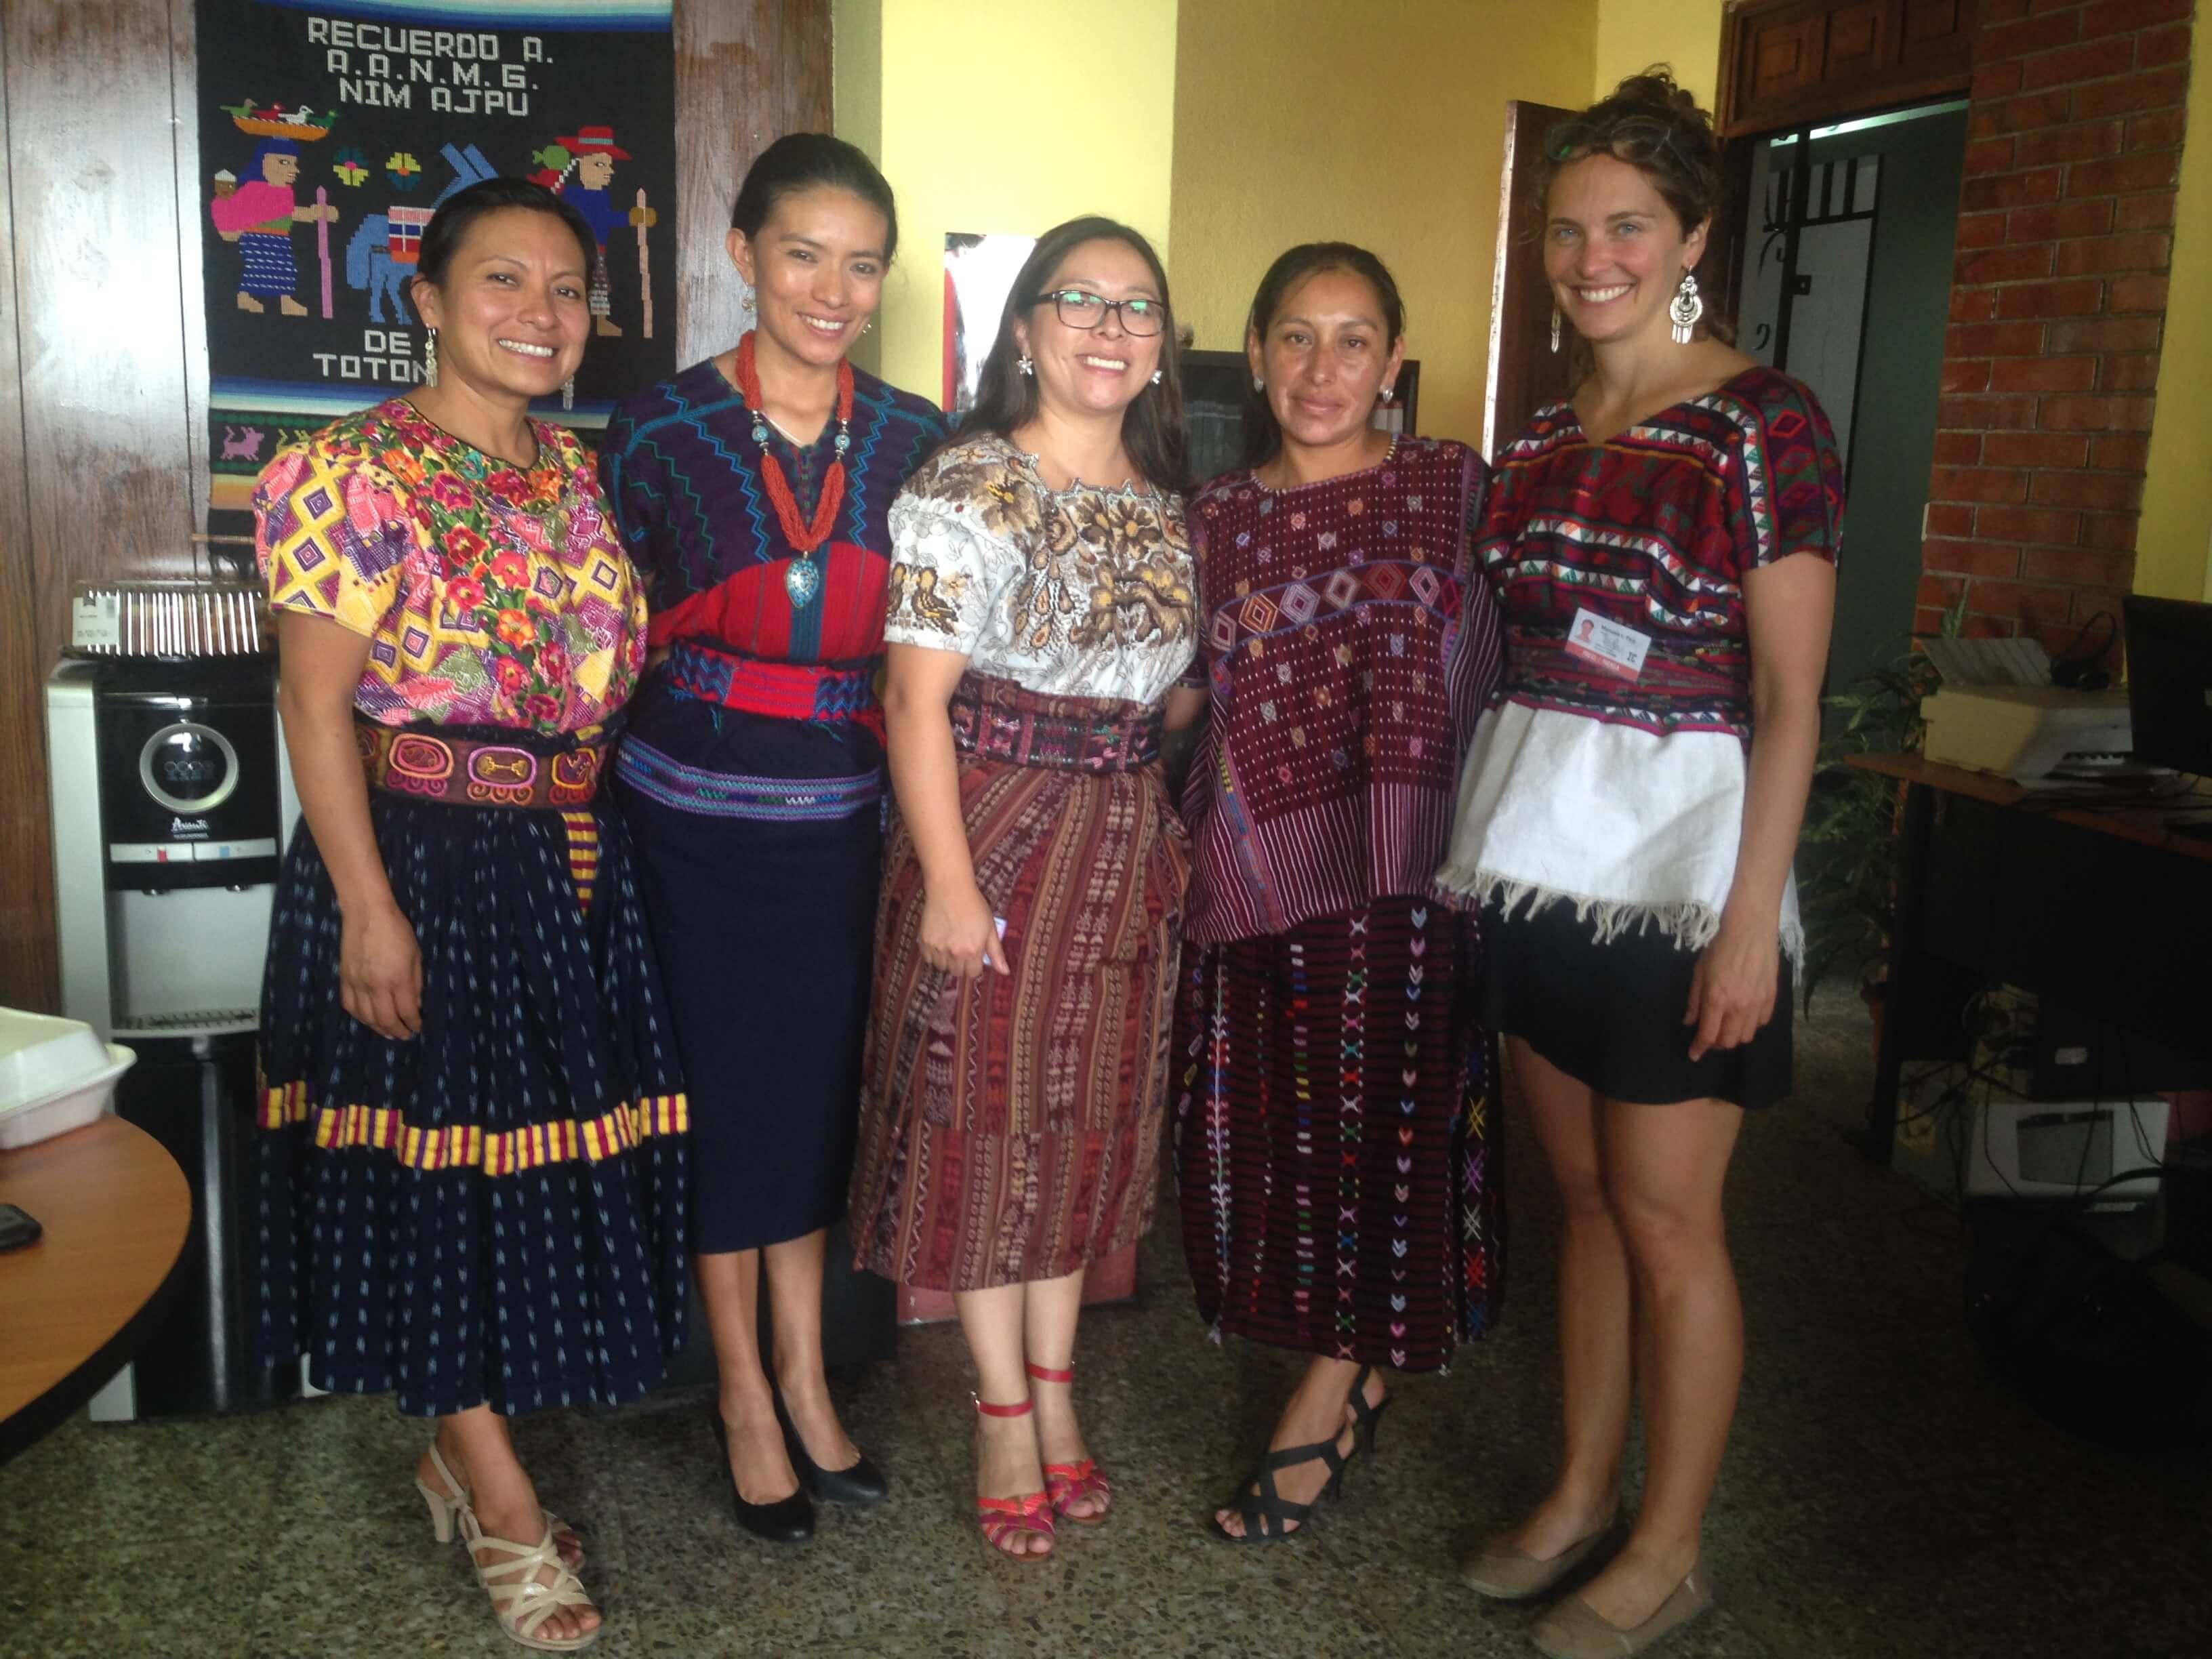 Nim Ajpu lawyers Angelina Aspuac, Ixquik Poz, Mellina Salvador, and  Rosa Ixcol  with Manuela Picq (right). Photo: José Agry Sian